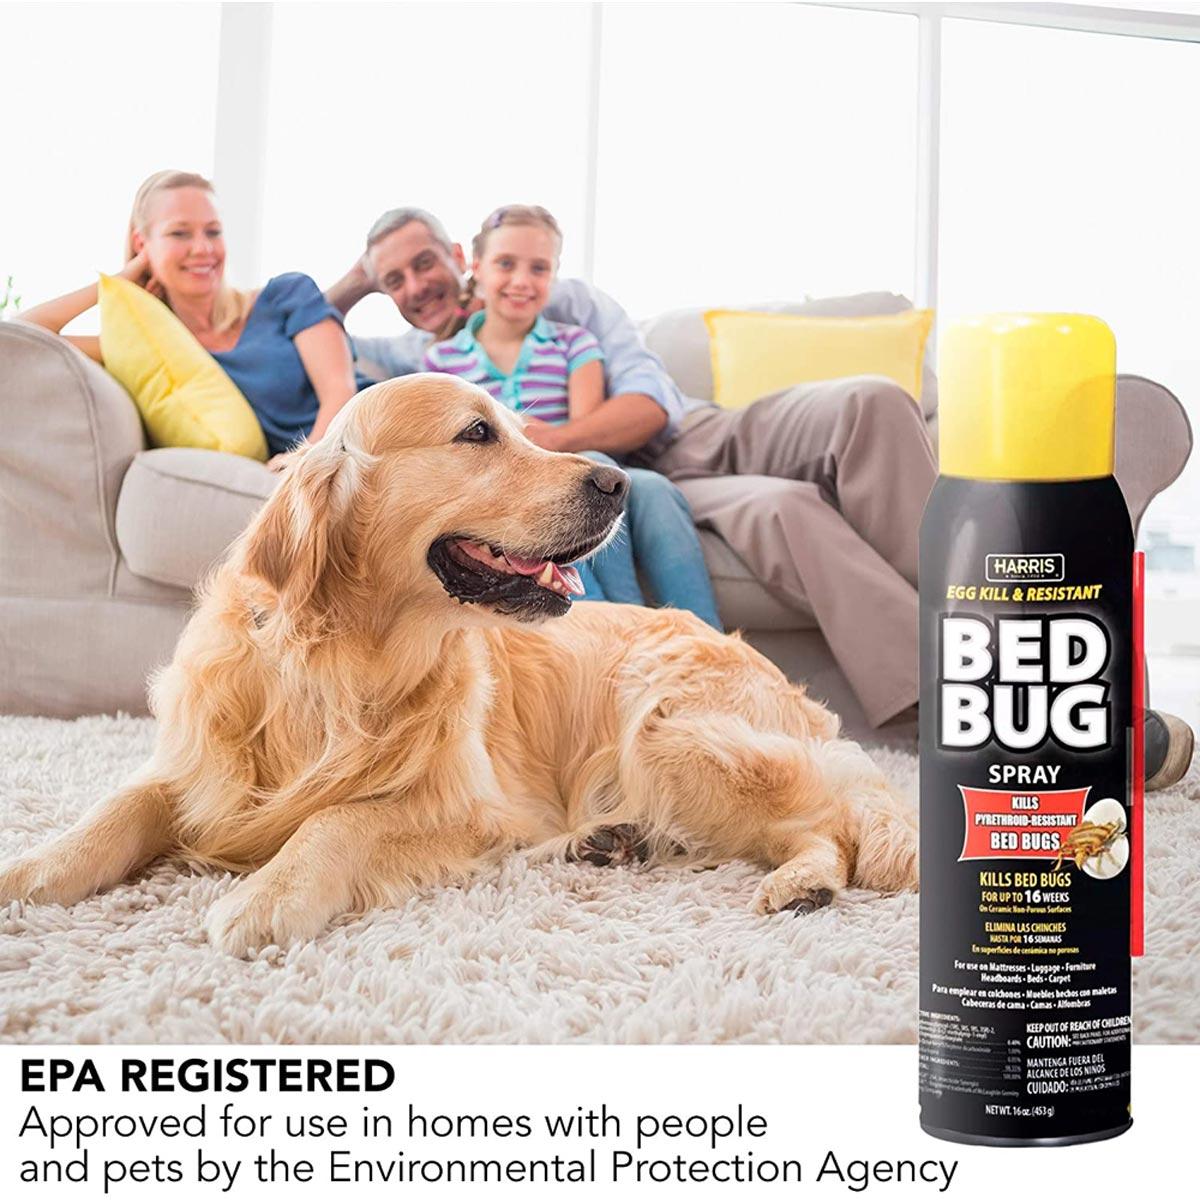 Harris Egg Kill & Resistant Bed Bug Killer, 16 oz. Aerosol Spray